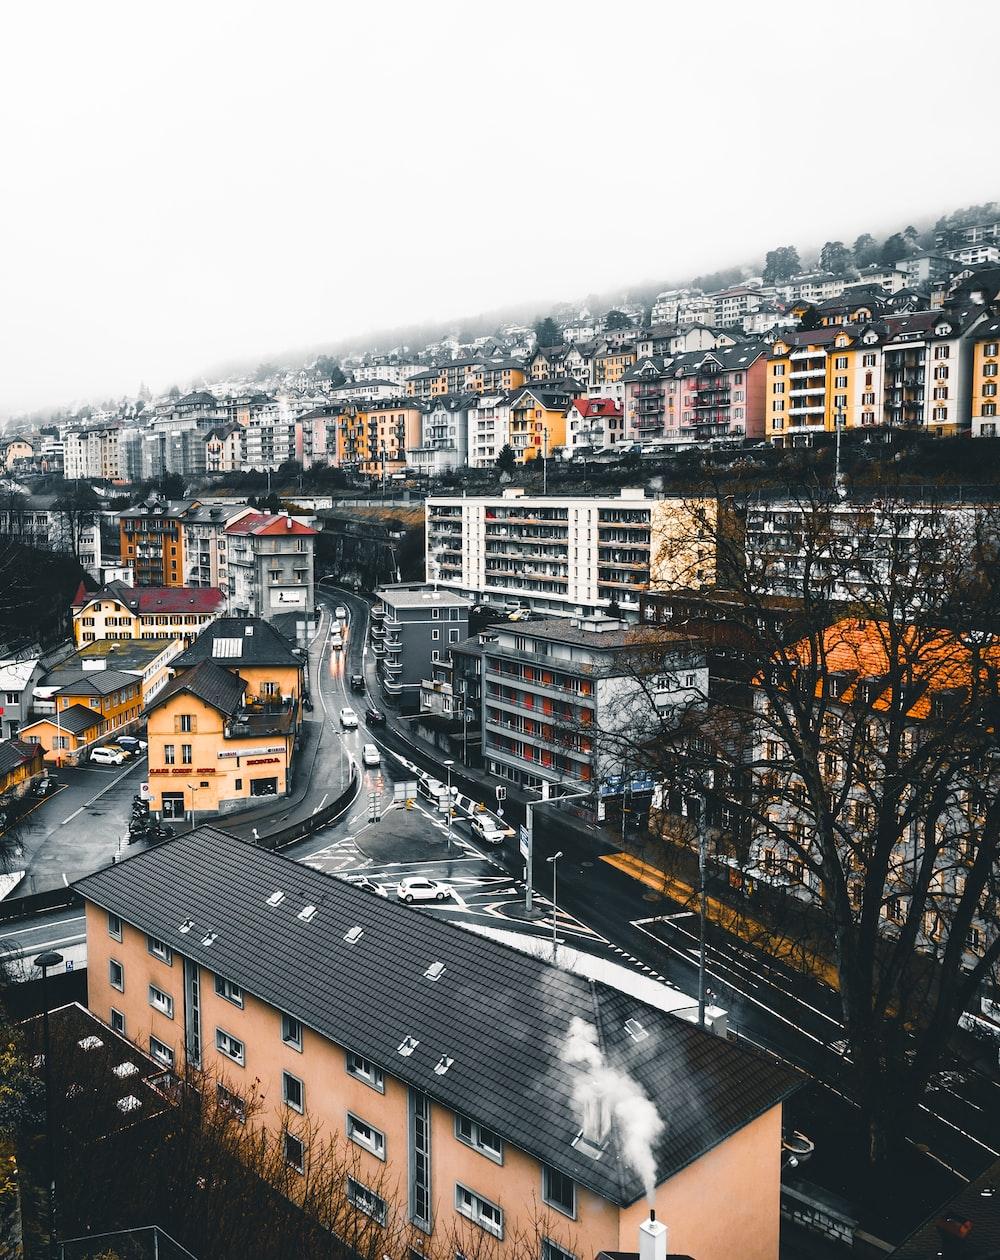 aerial shot photo of buildings